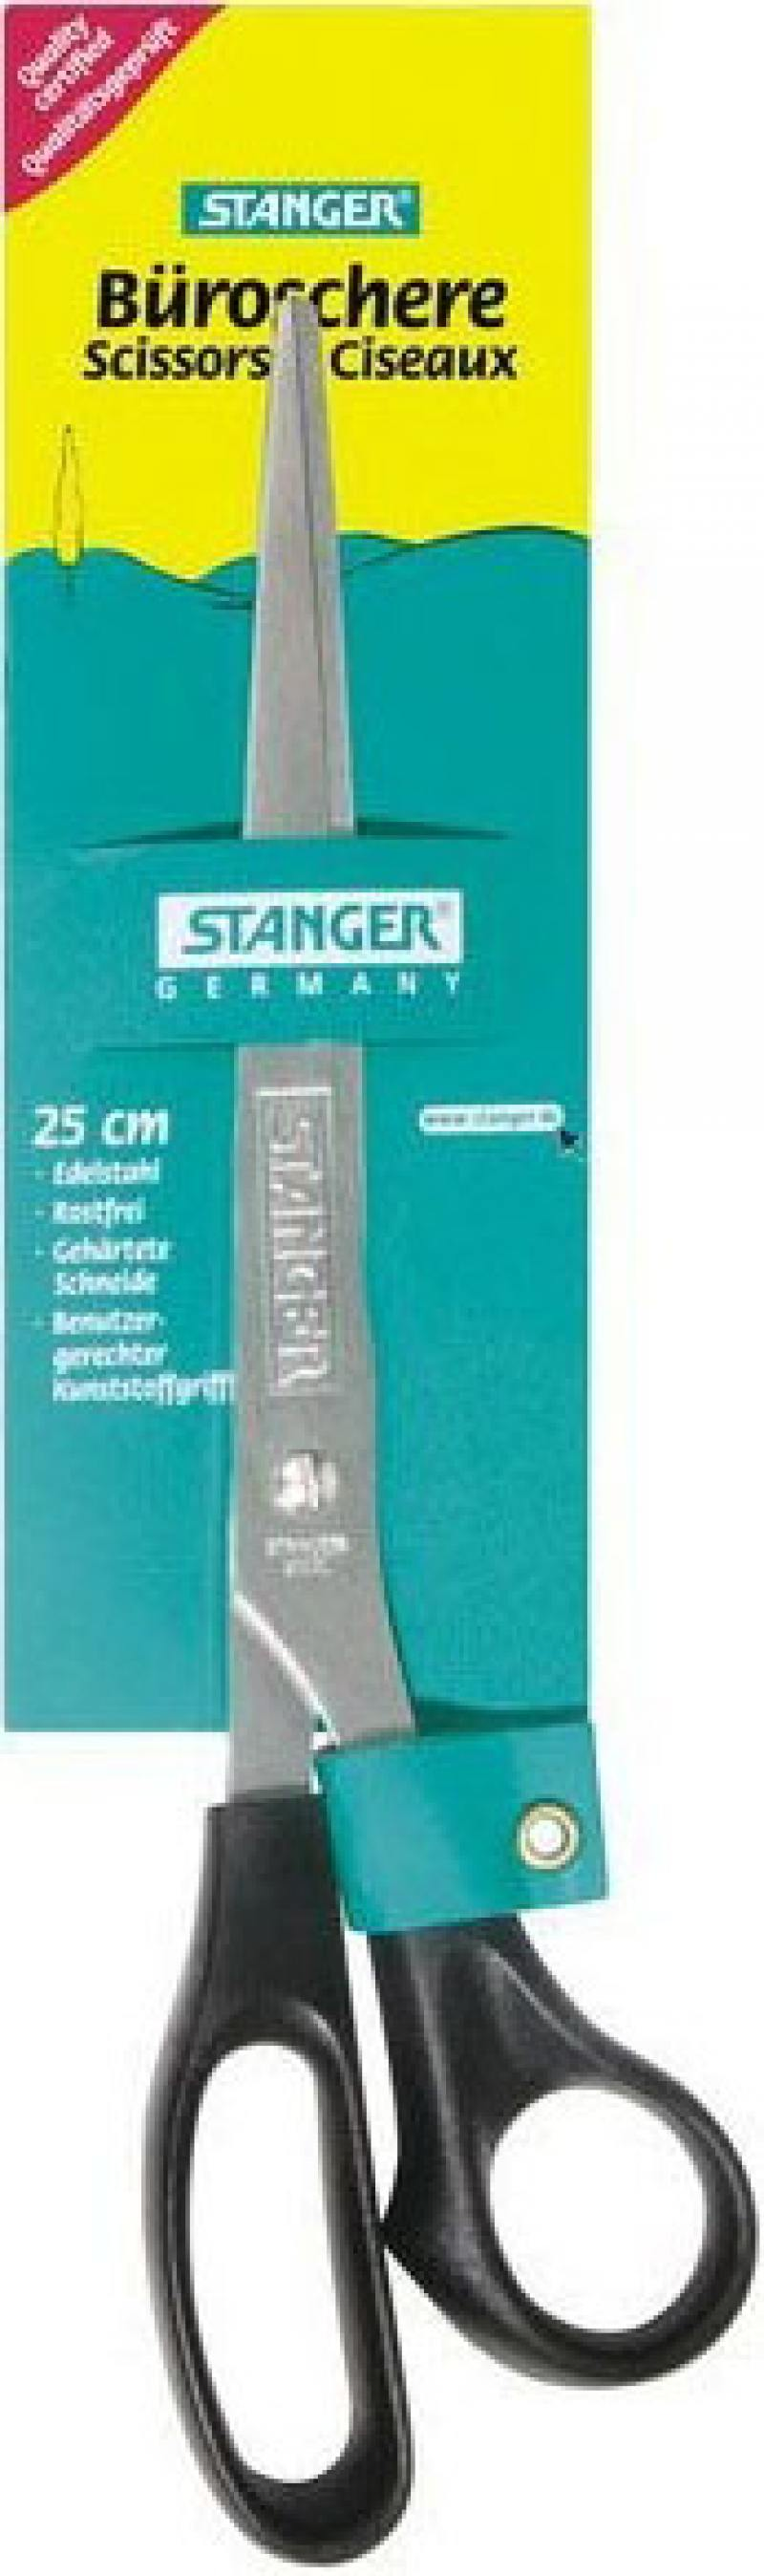 Ножницы Stanger 34103 12.5 см perfeo защитное стекло apple iphone xs max черный 2 5d full screen gorilla pf a4469